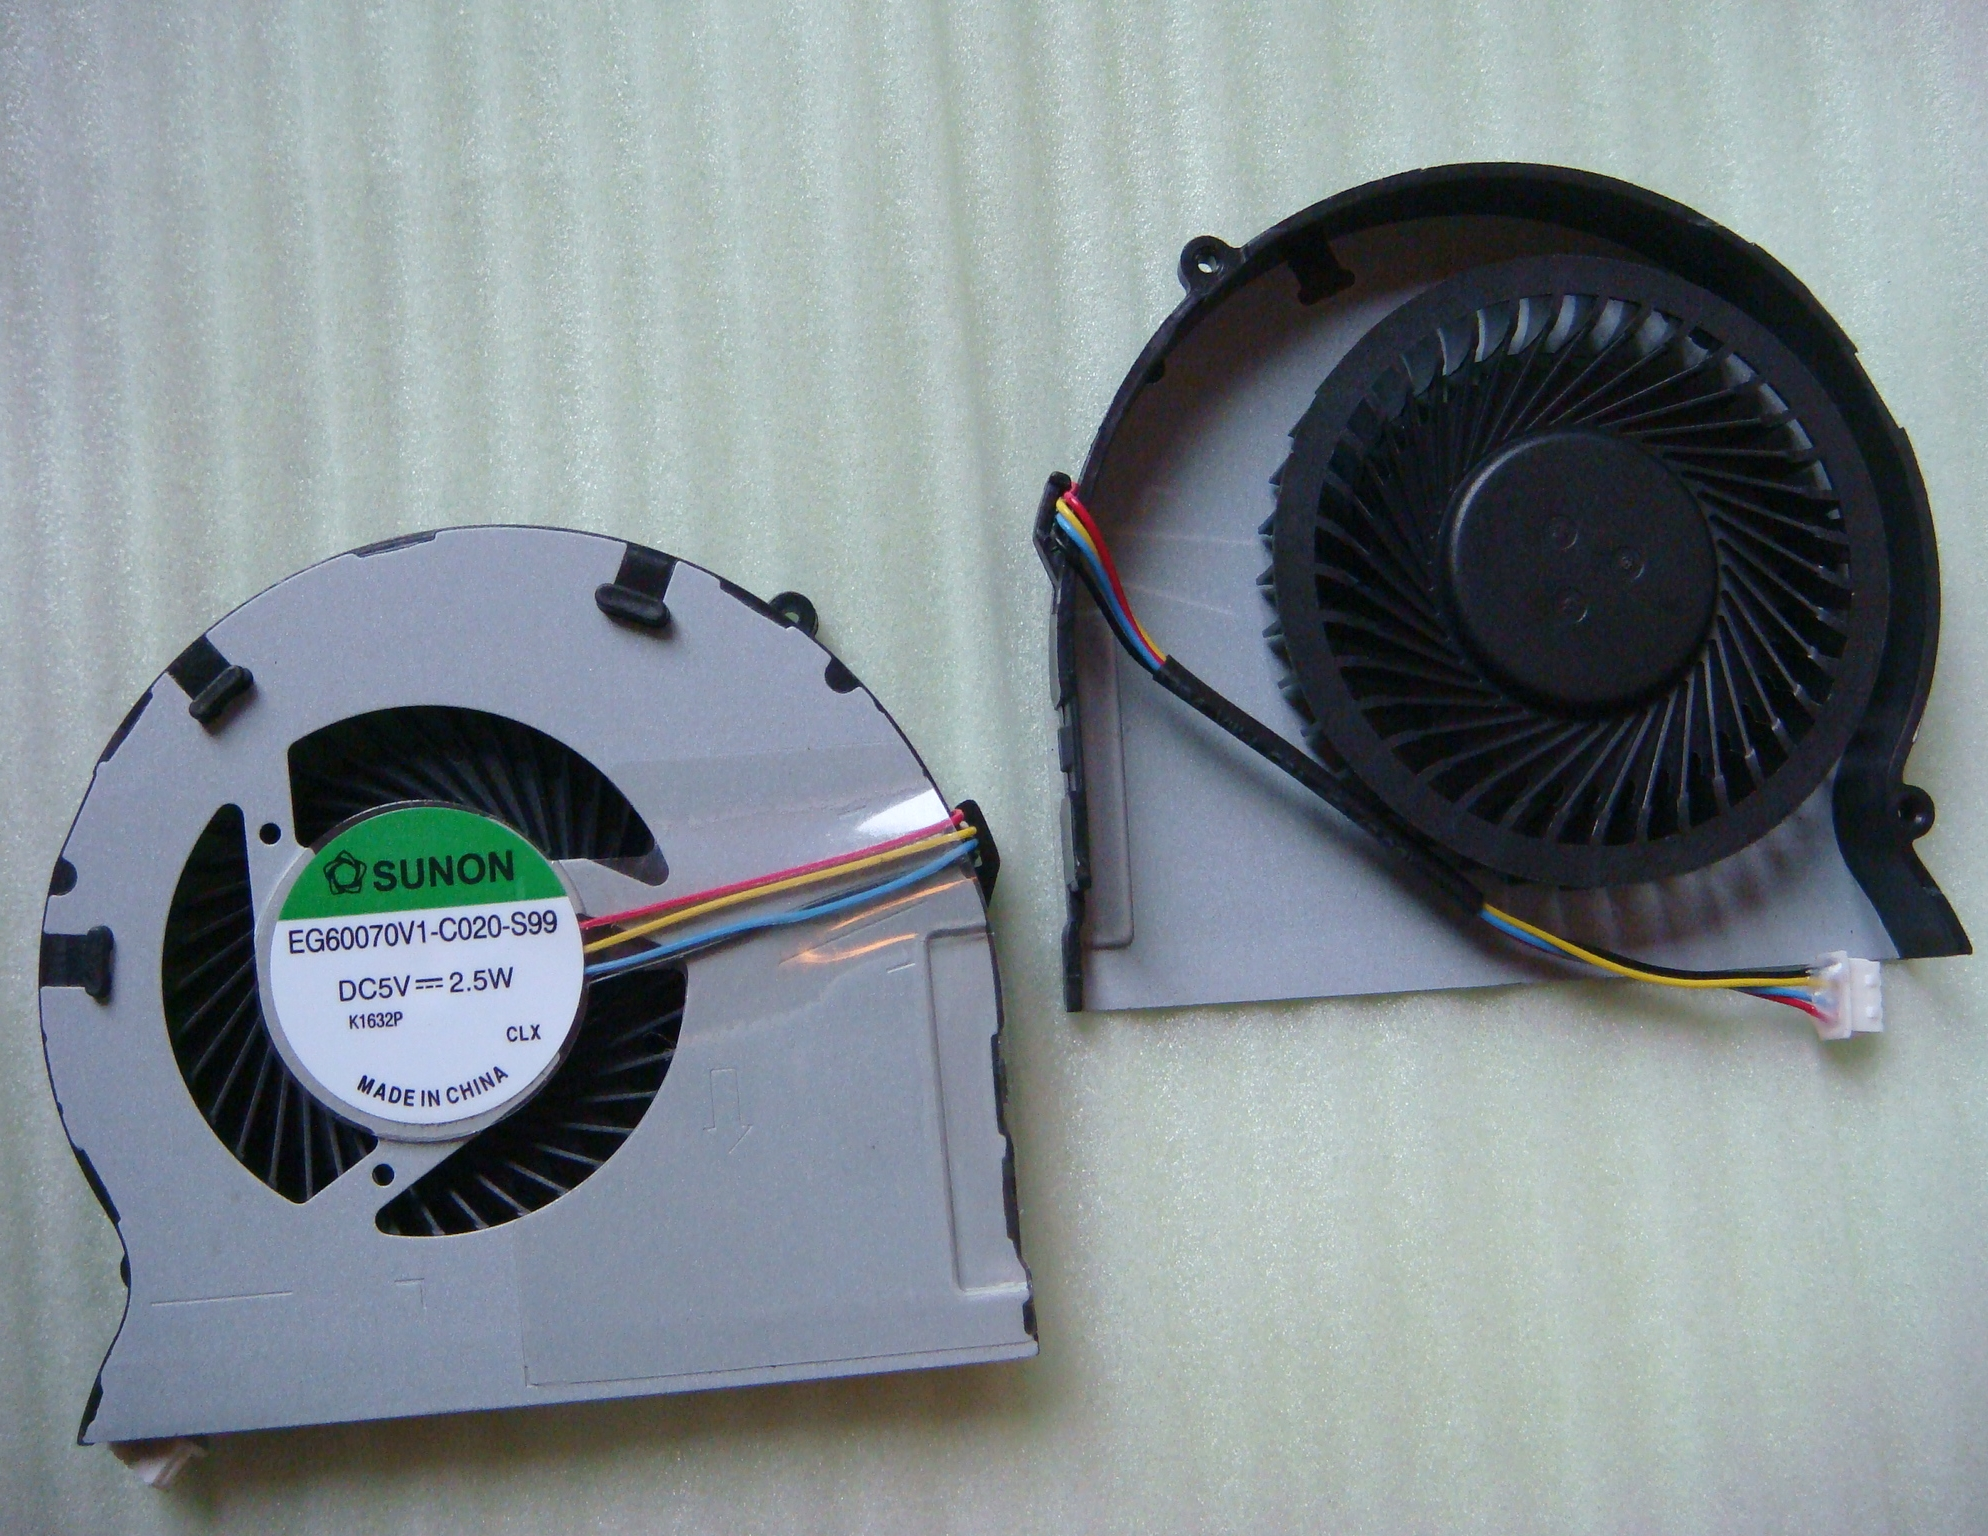 Laptop Cpu Cooling Fan For Ideapad Z470 4 Wire Buy Batre Leptop Lenovo